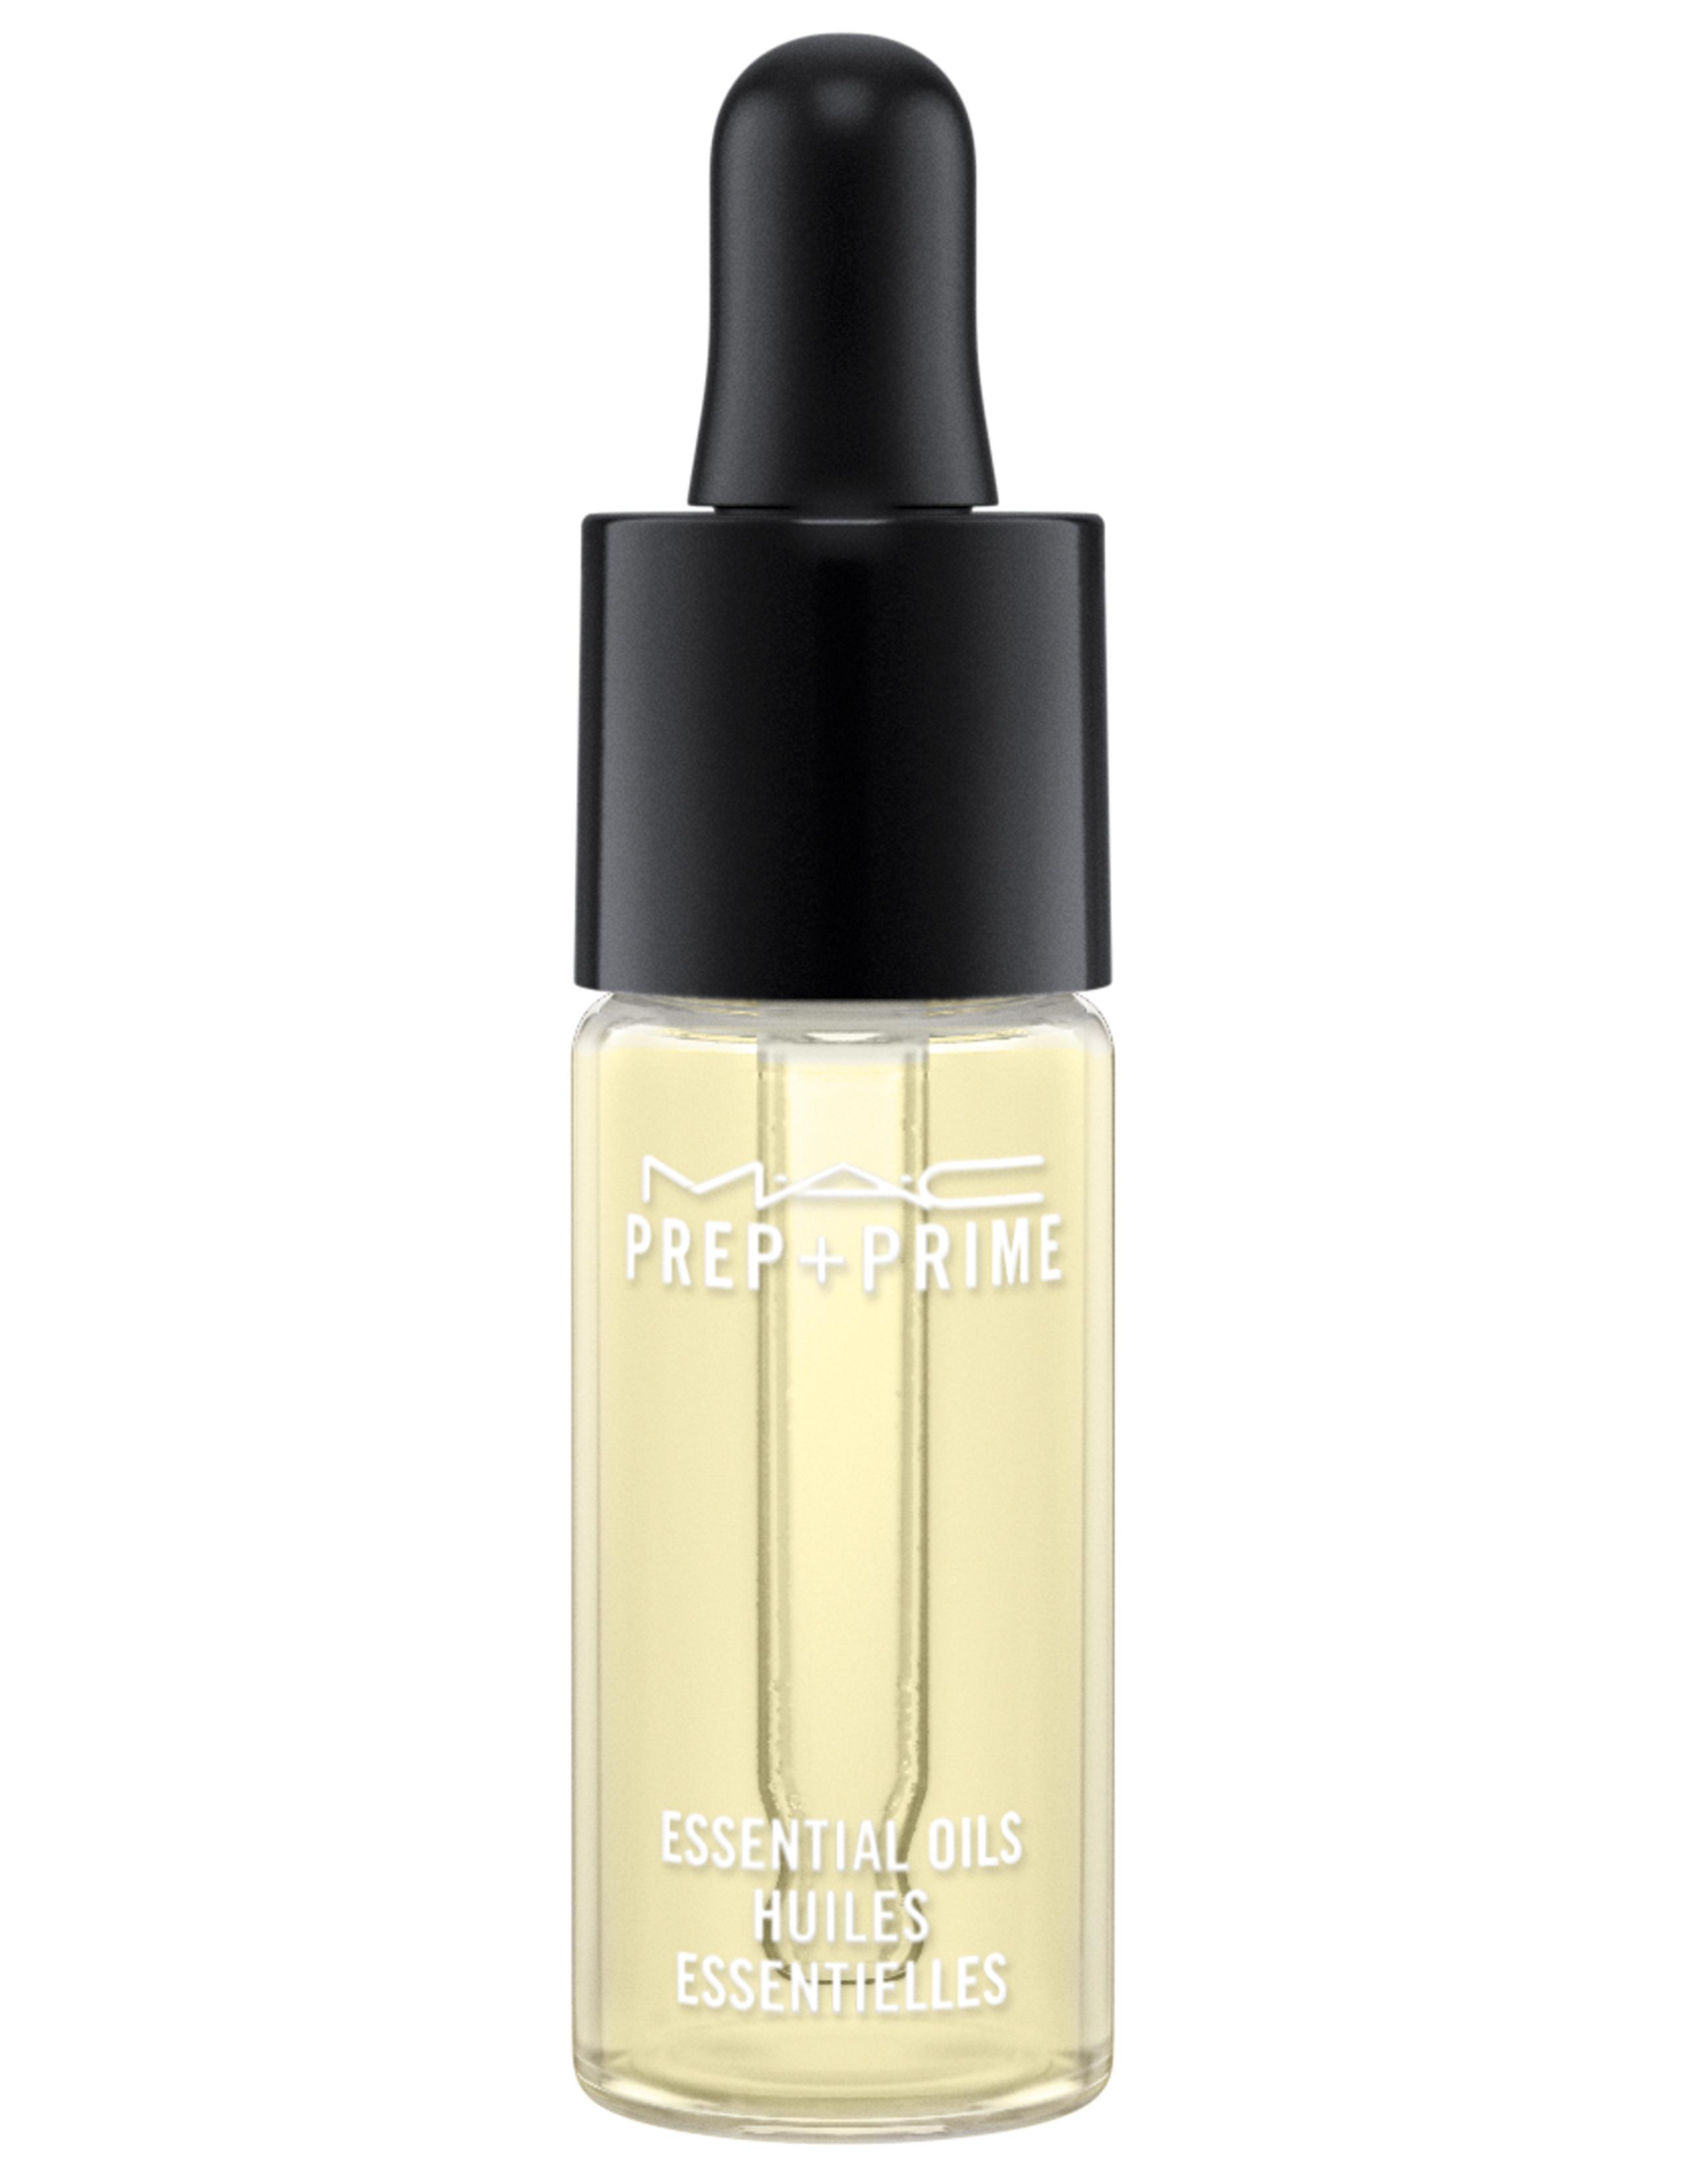 MAC_PrepPlusPrimeEssentialOils_Oil_GrapefruitAndChamomile_white_300dpiCMYK_1